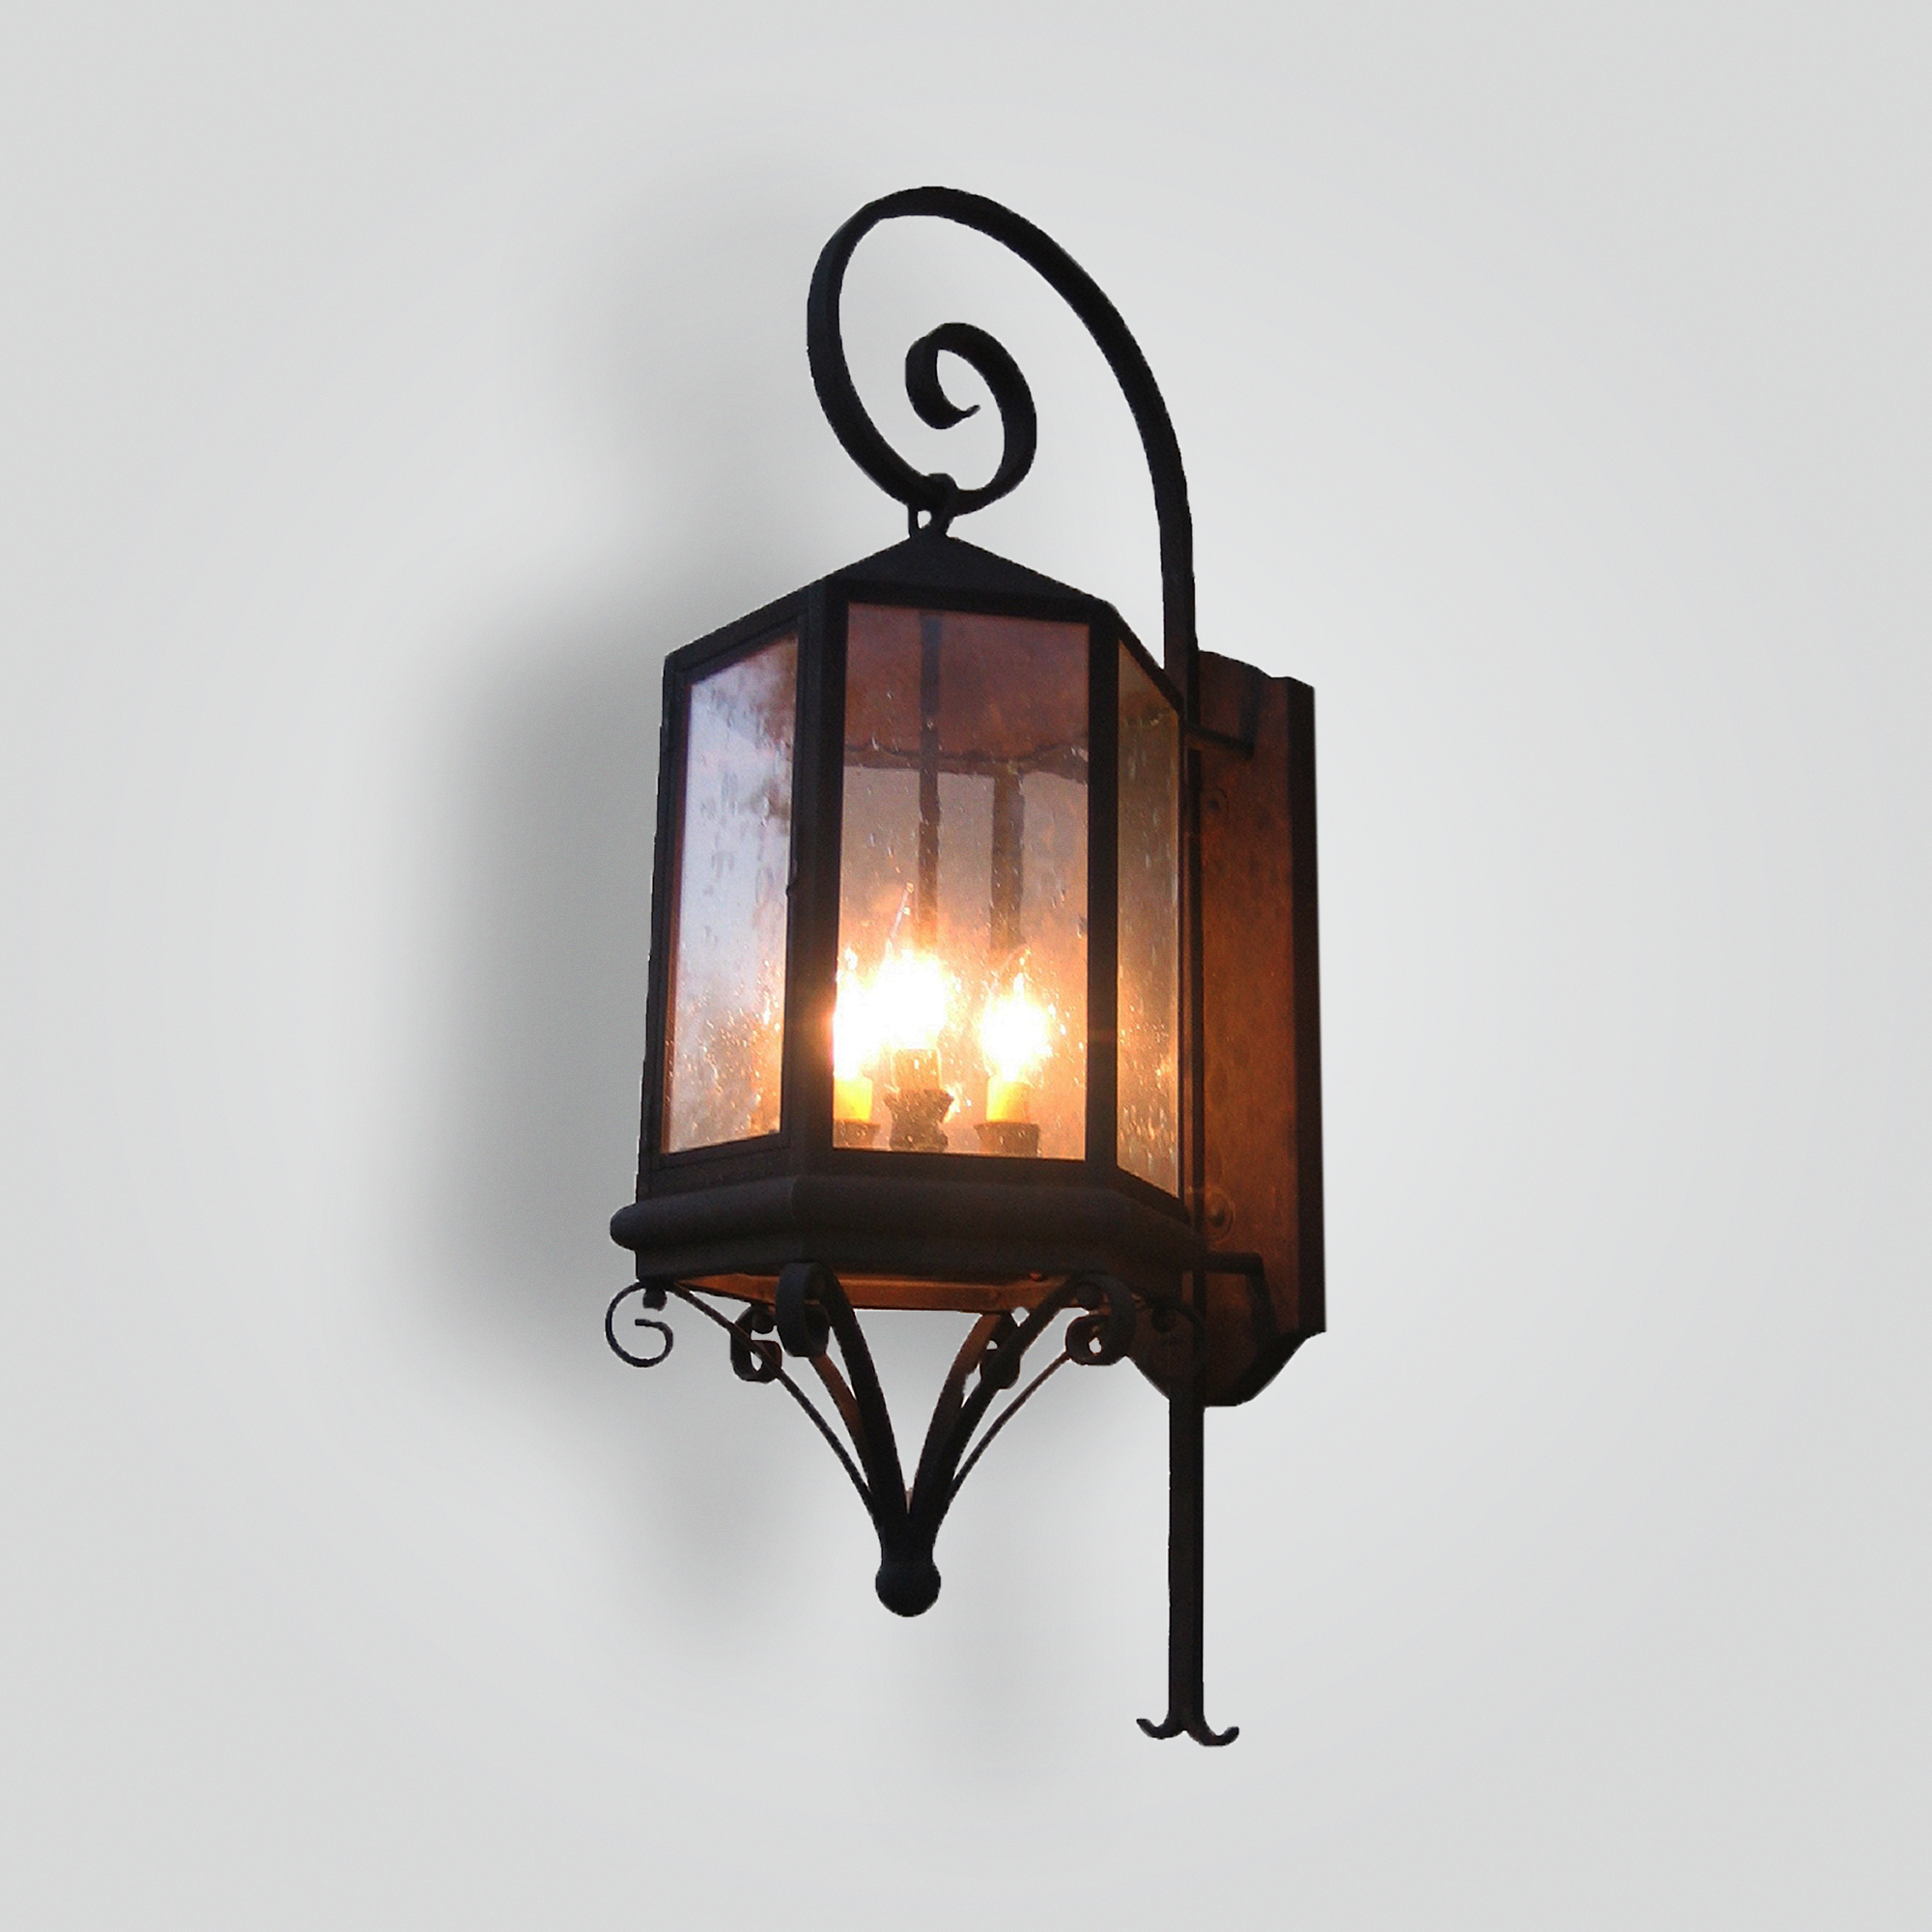 682-cb4-br-w-shba Kane Transitional Lantern – ADG Lighting Collection